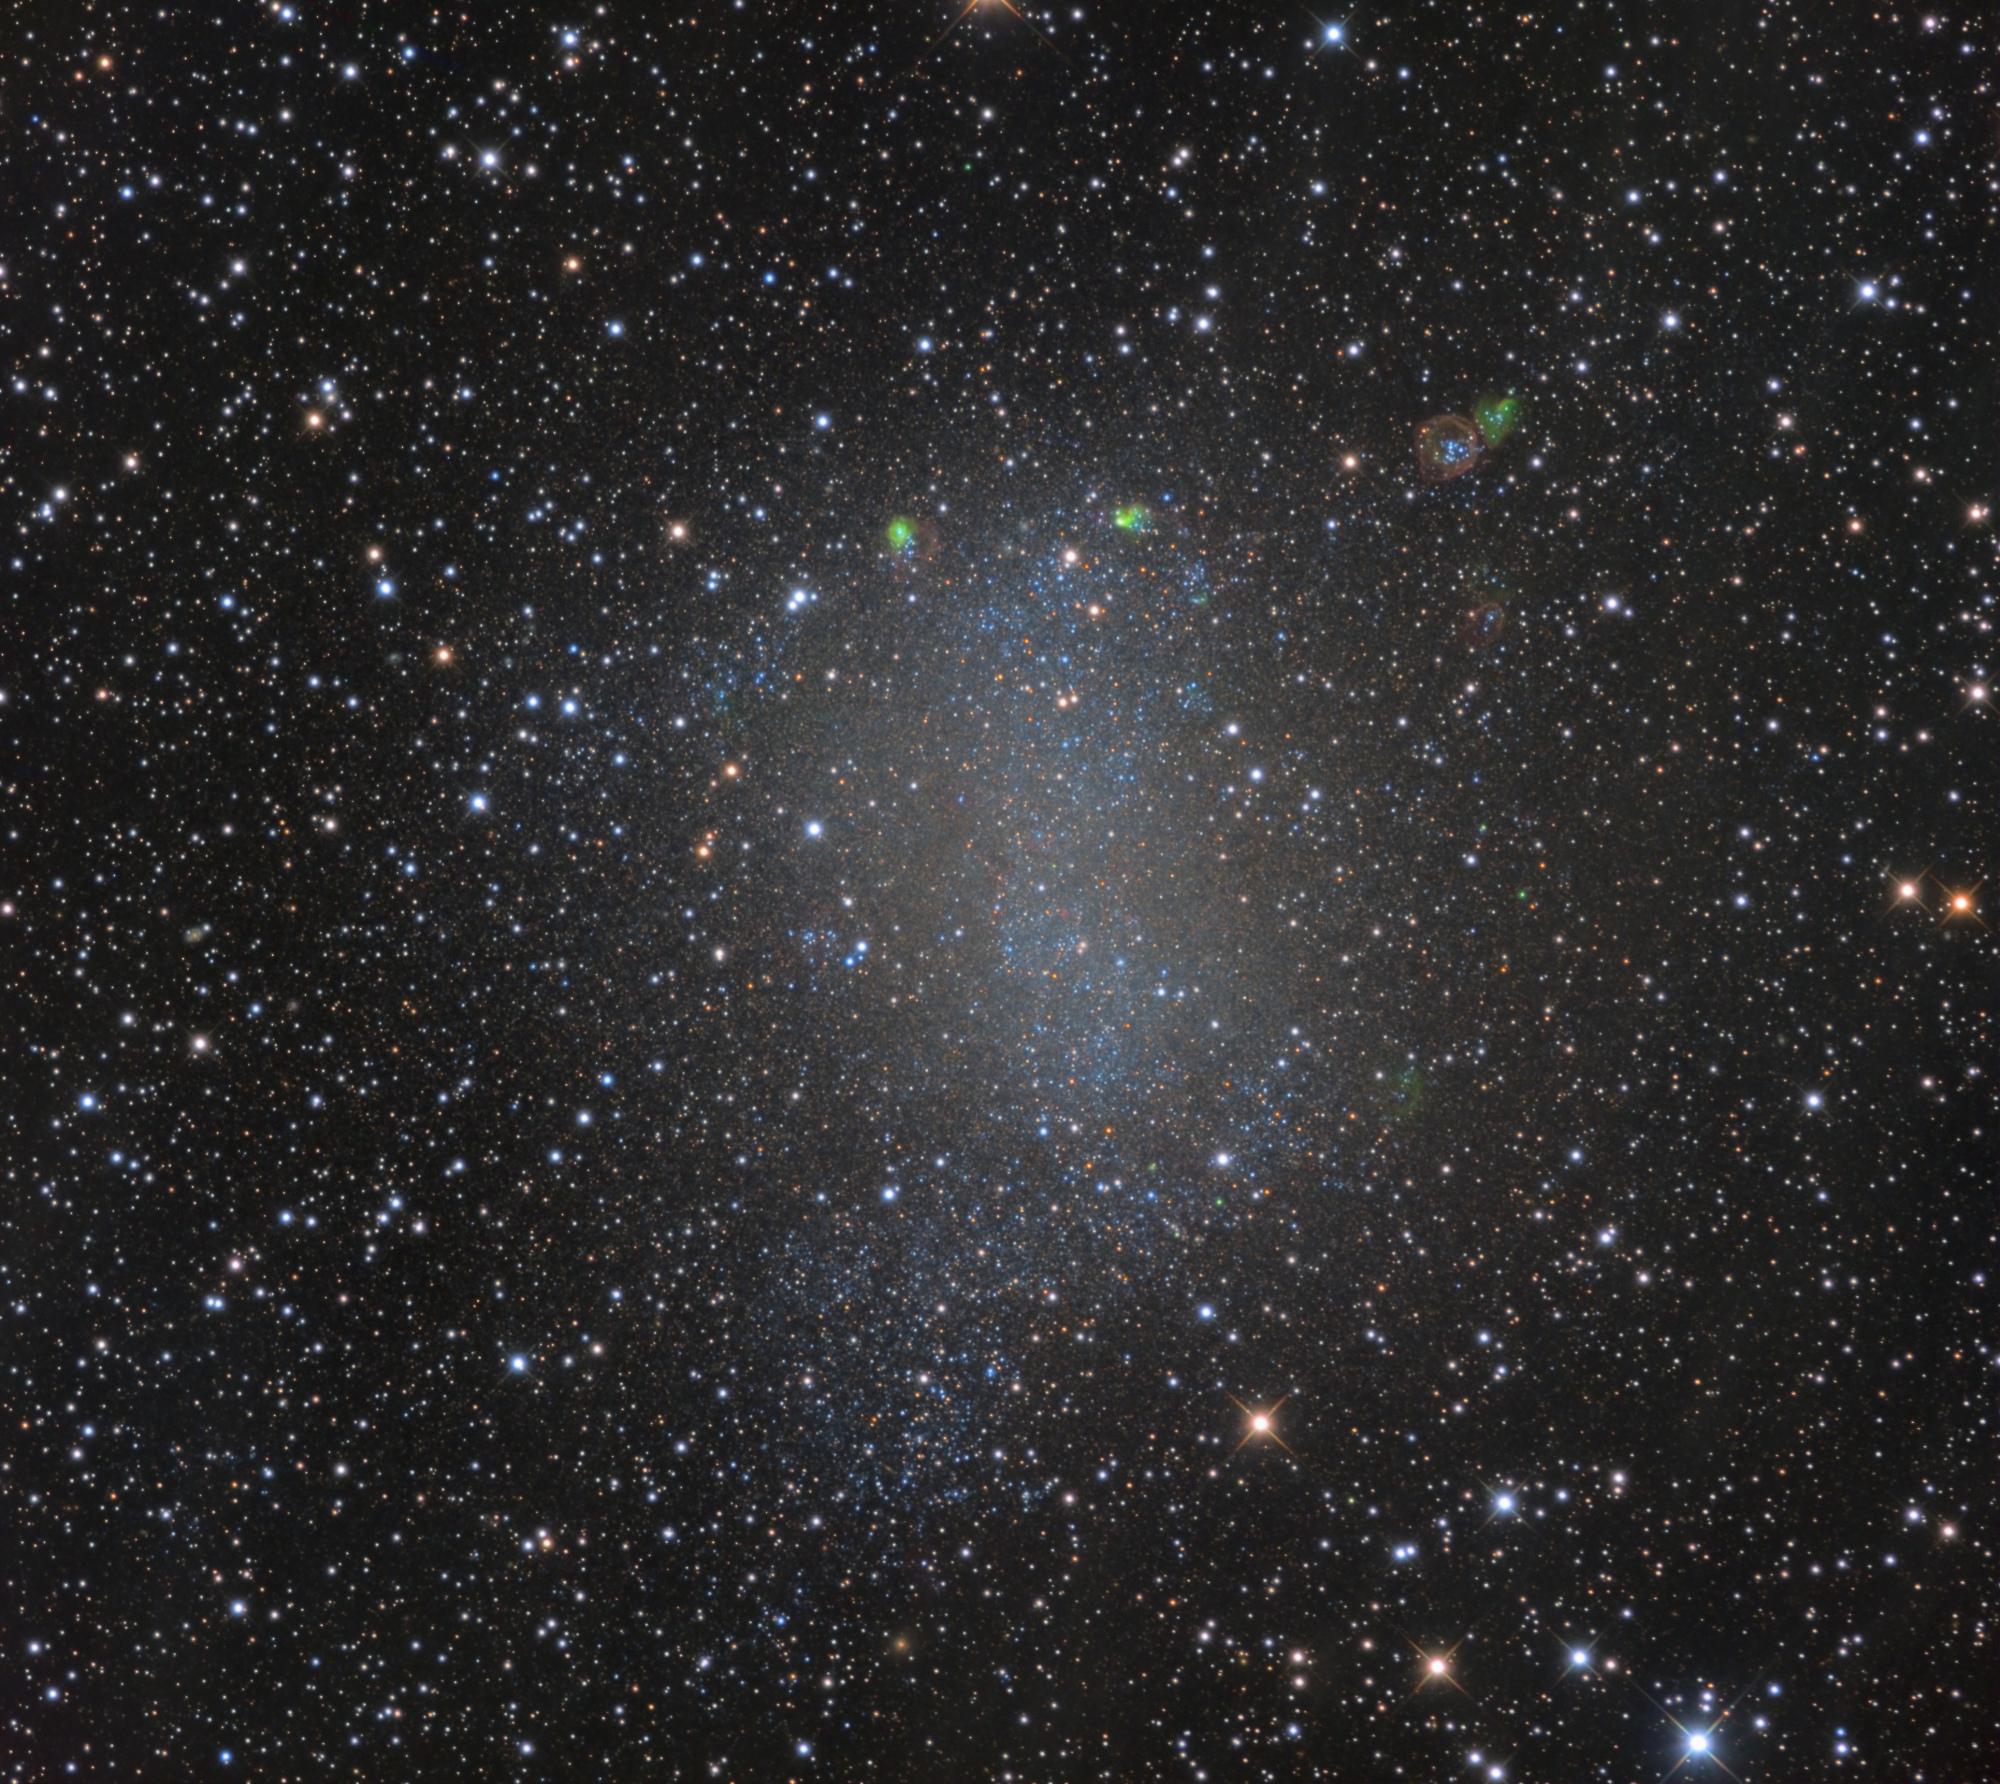 NGC6822-LRVB-V4-Crop.thumb.jpg.920f50fa09a19704ef04c86c192a4628.jpg